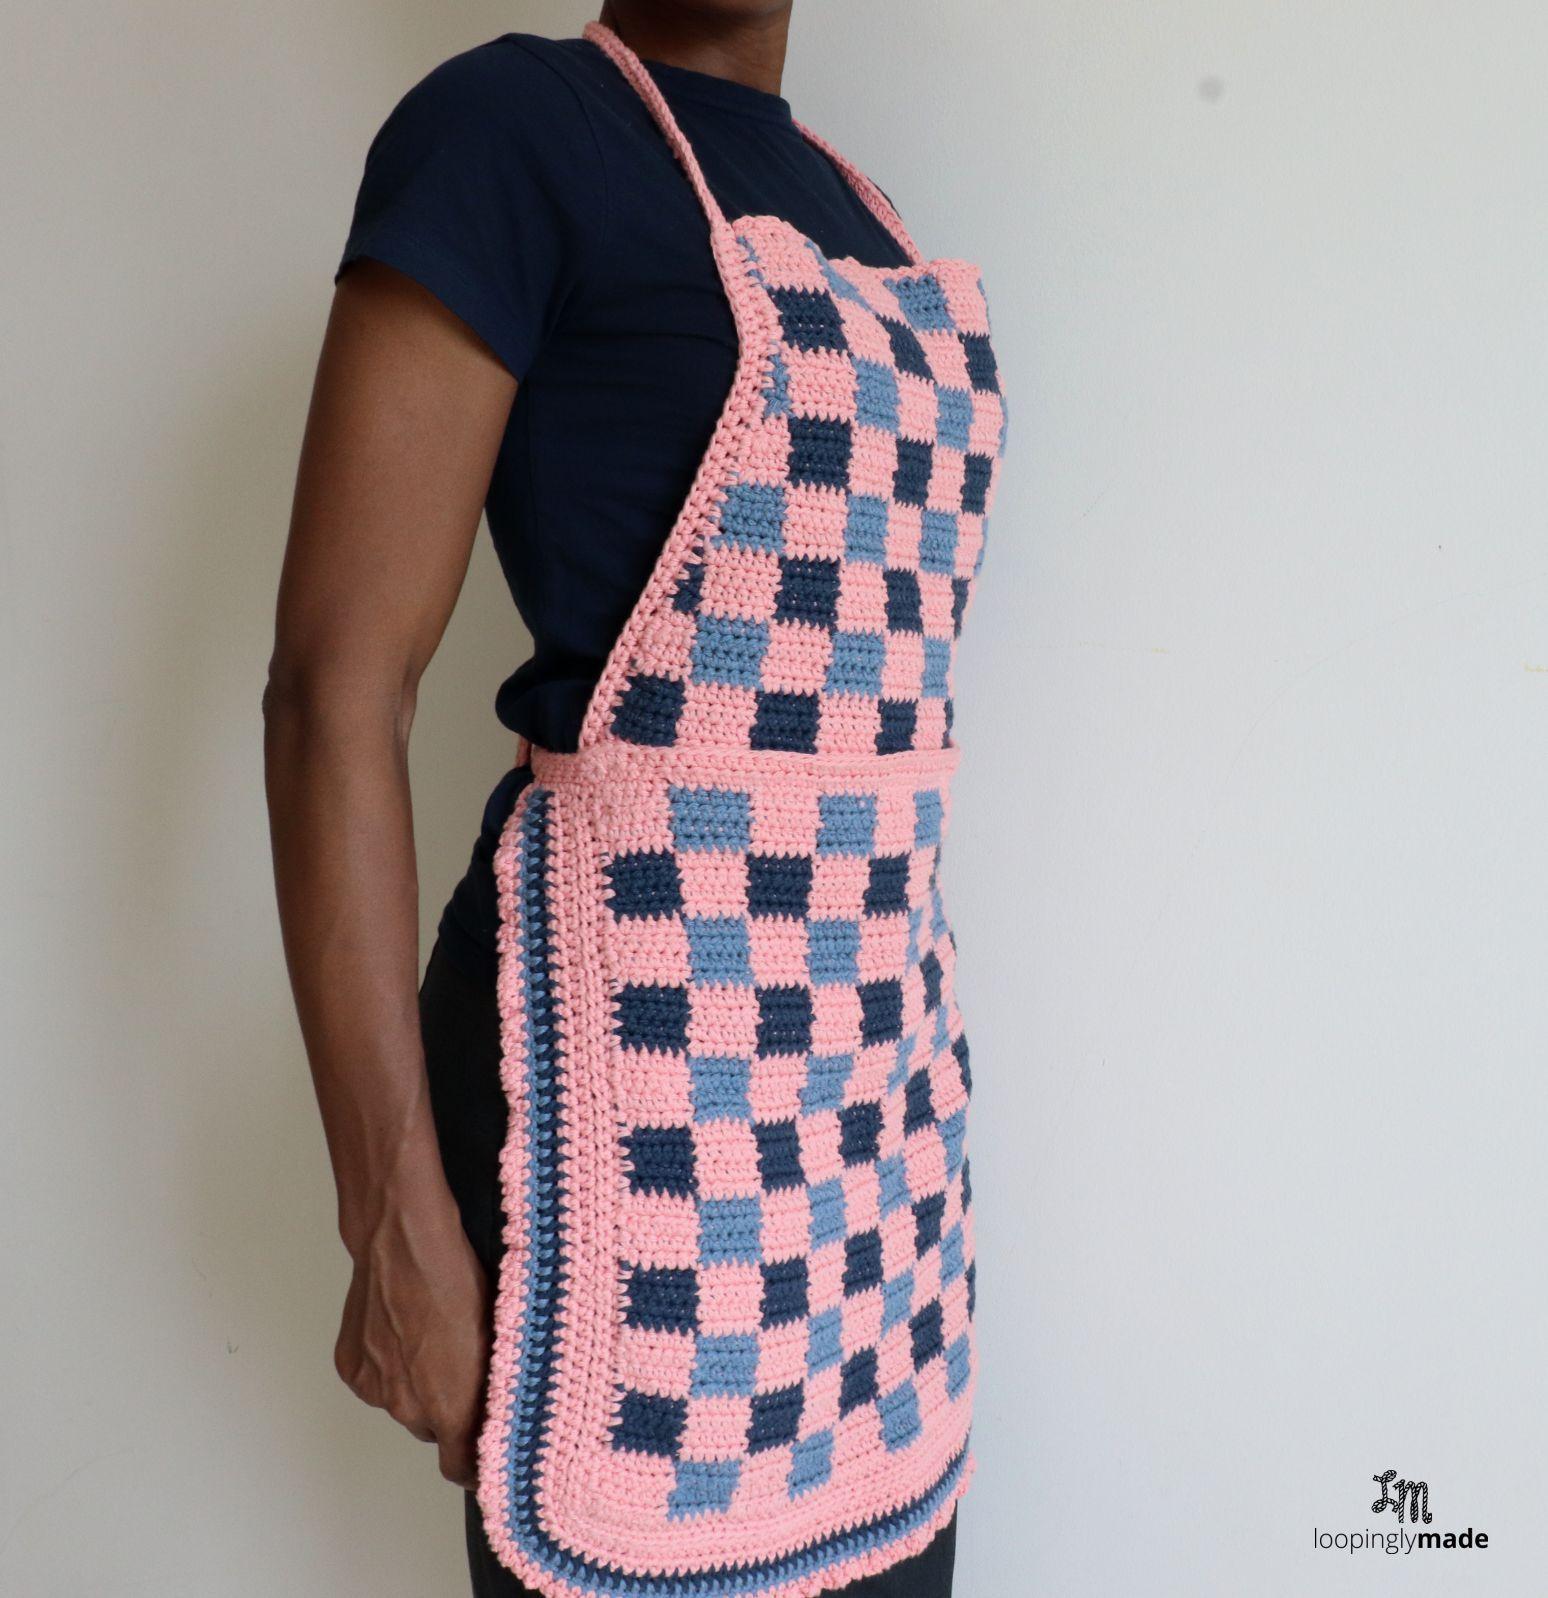 Crochet Checkered Two Piece Apron Free Crochet Pattern Apron